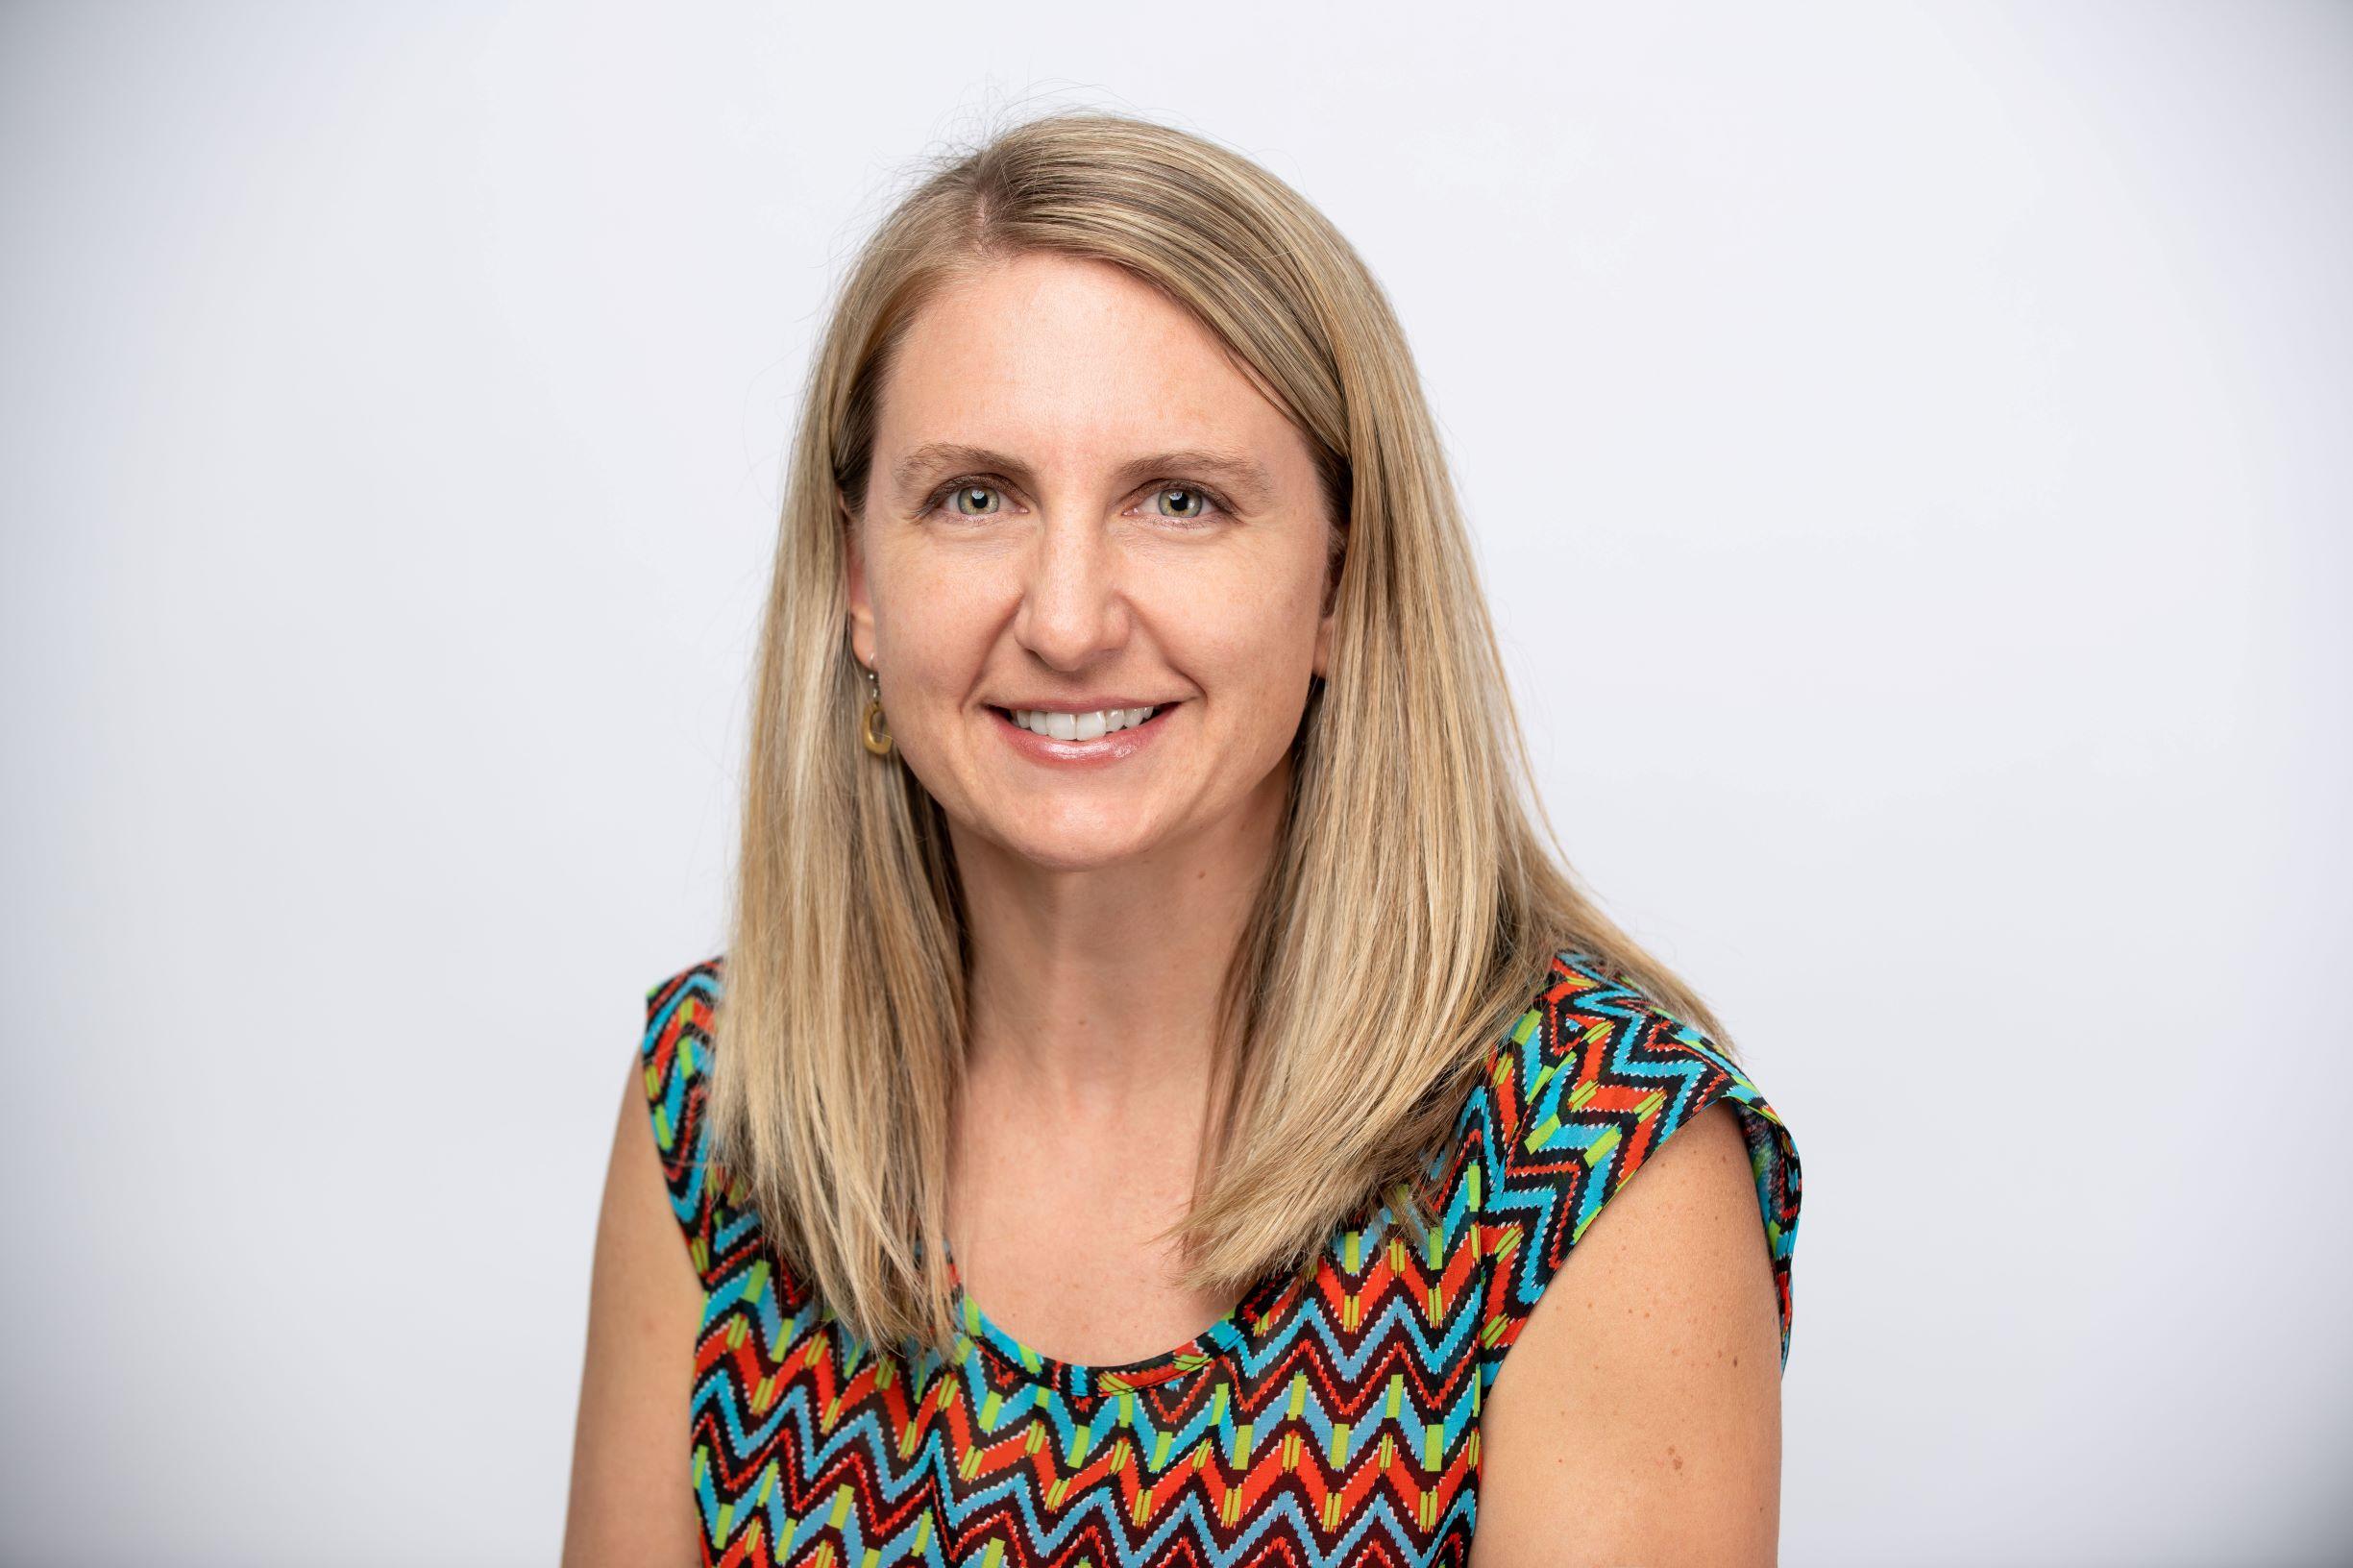 Melissa Decker